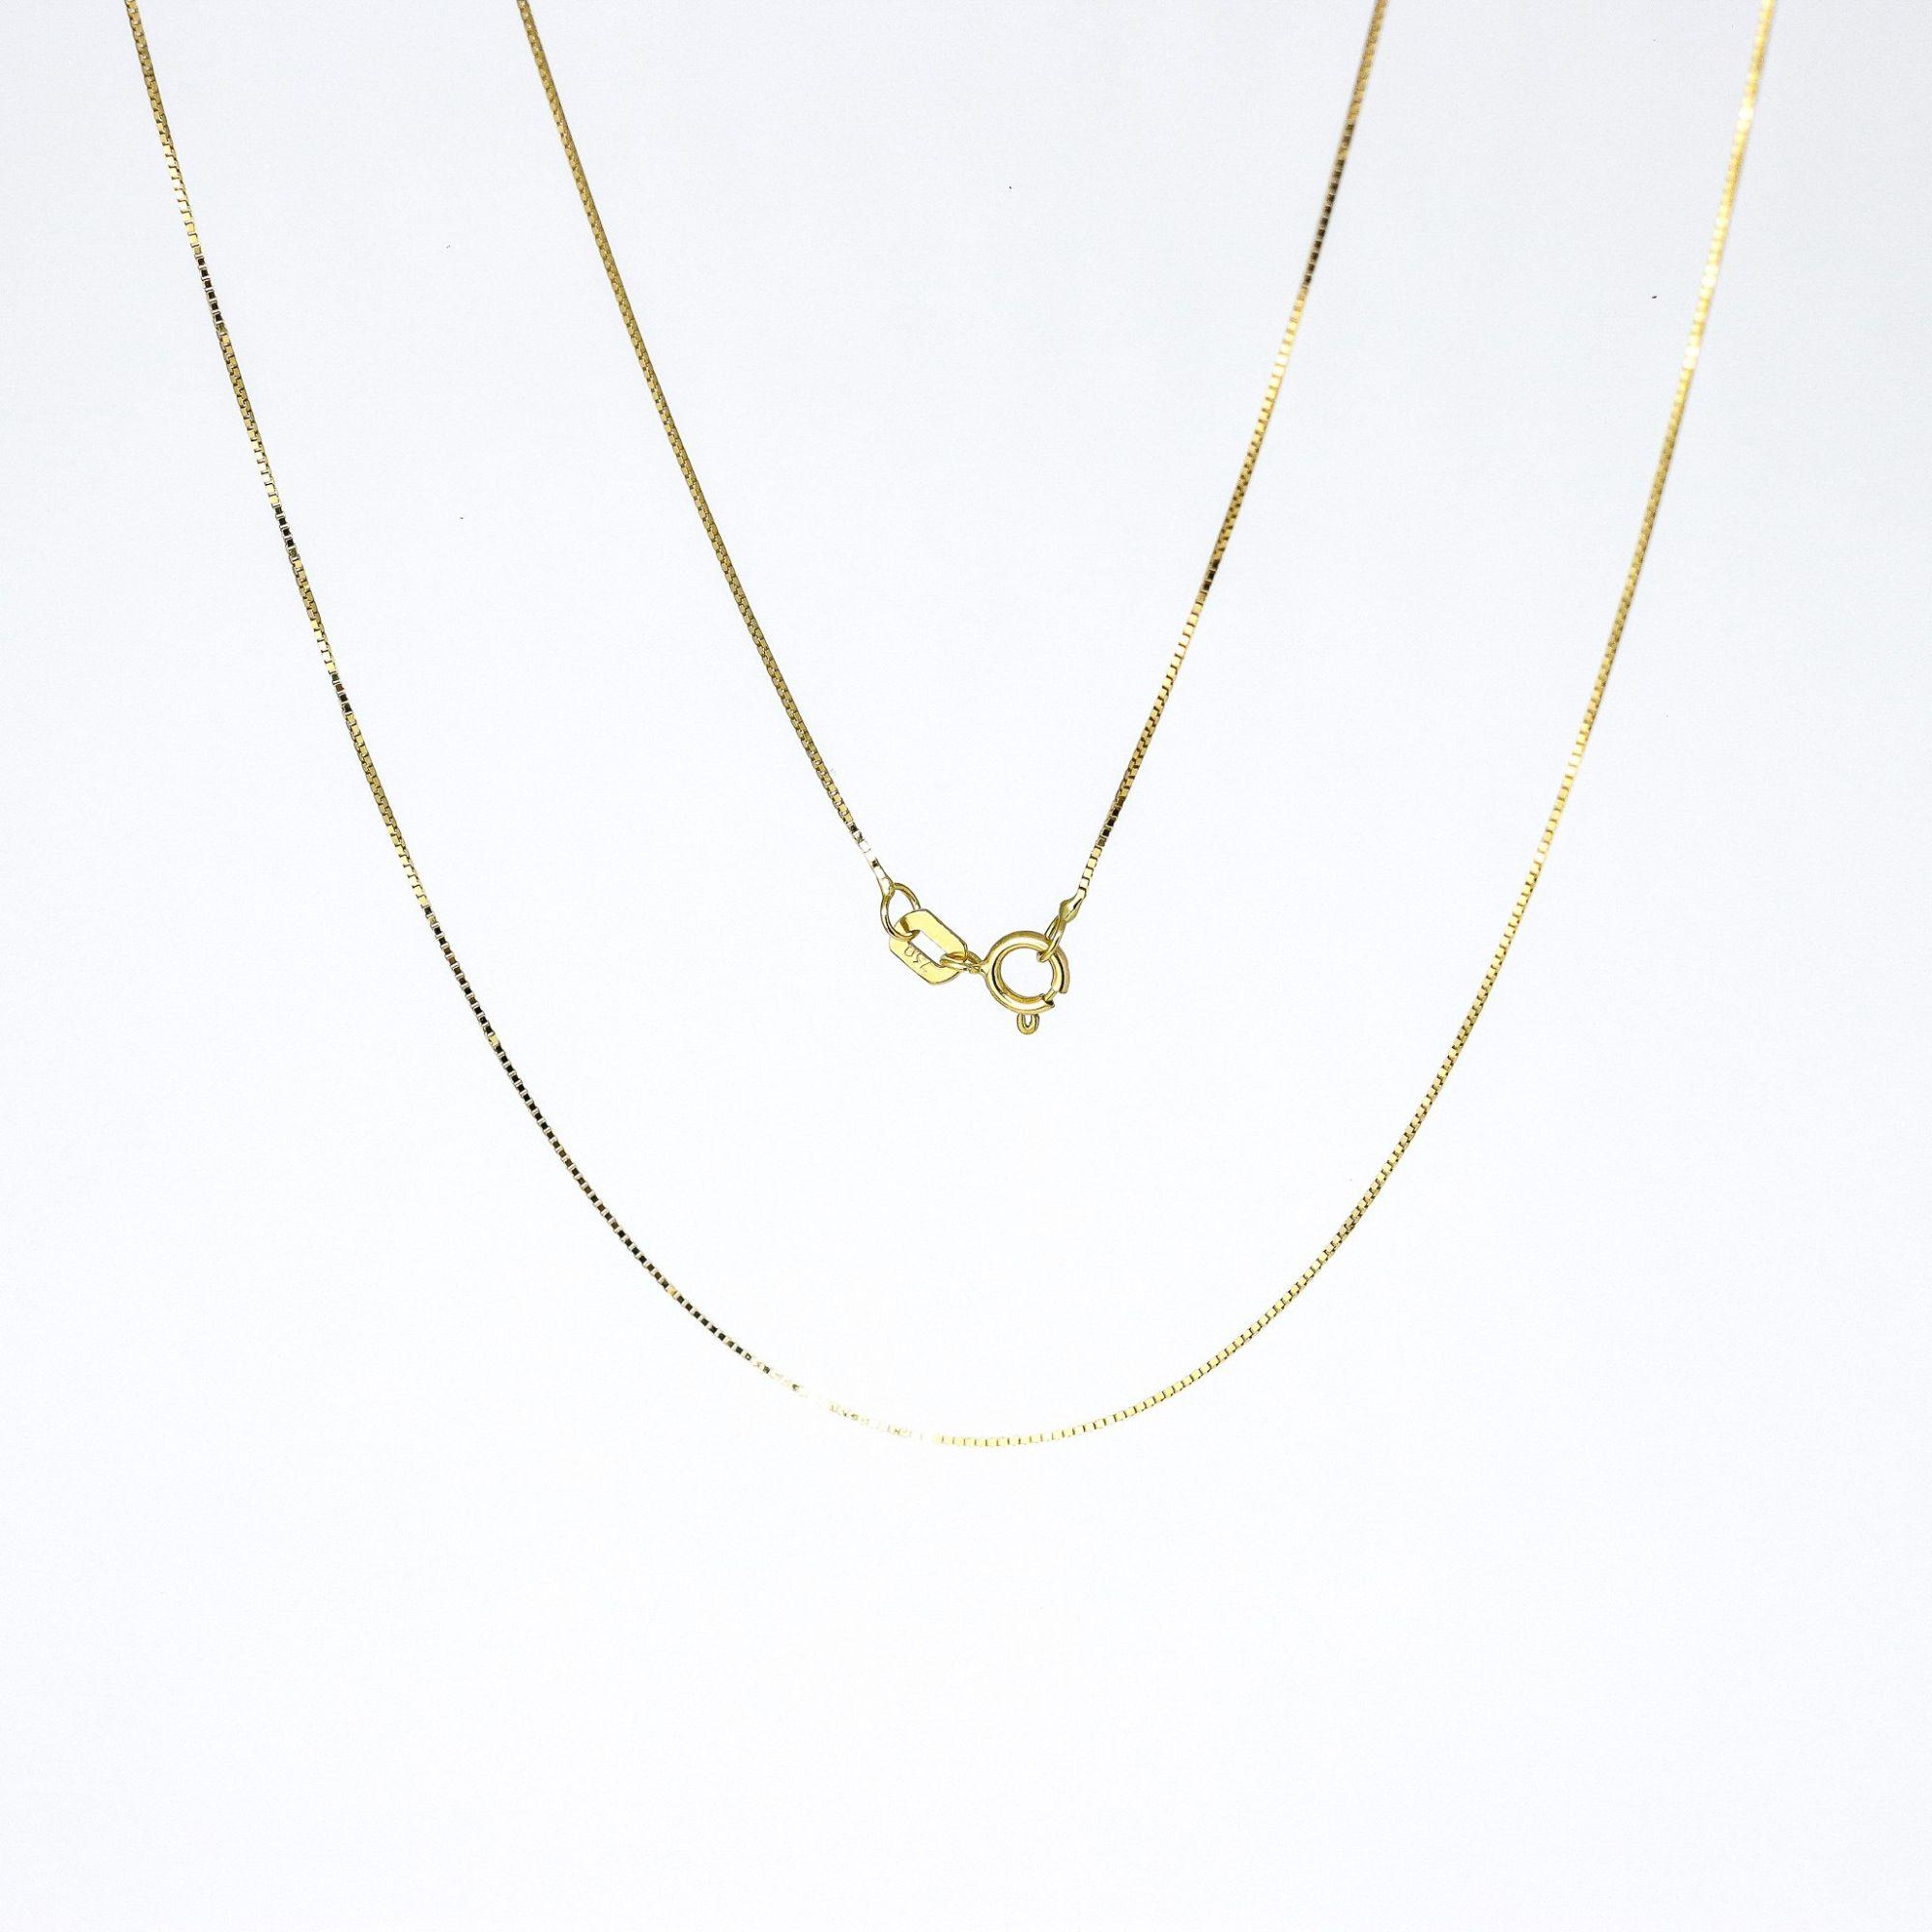 Corrente ouro 18k veneziana 45 cm